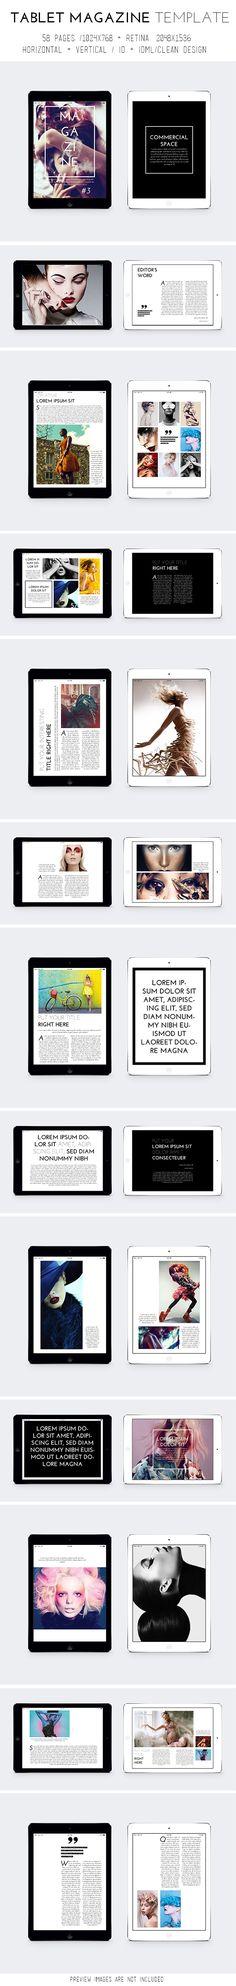 Tablet Magazine Template on Behance